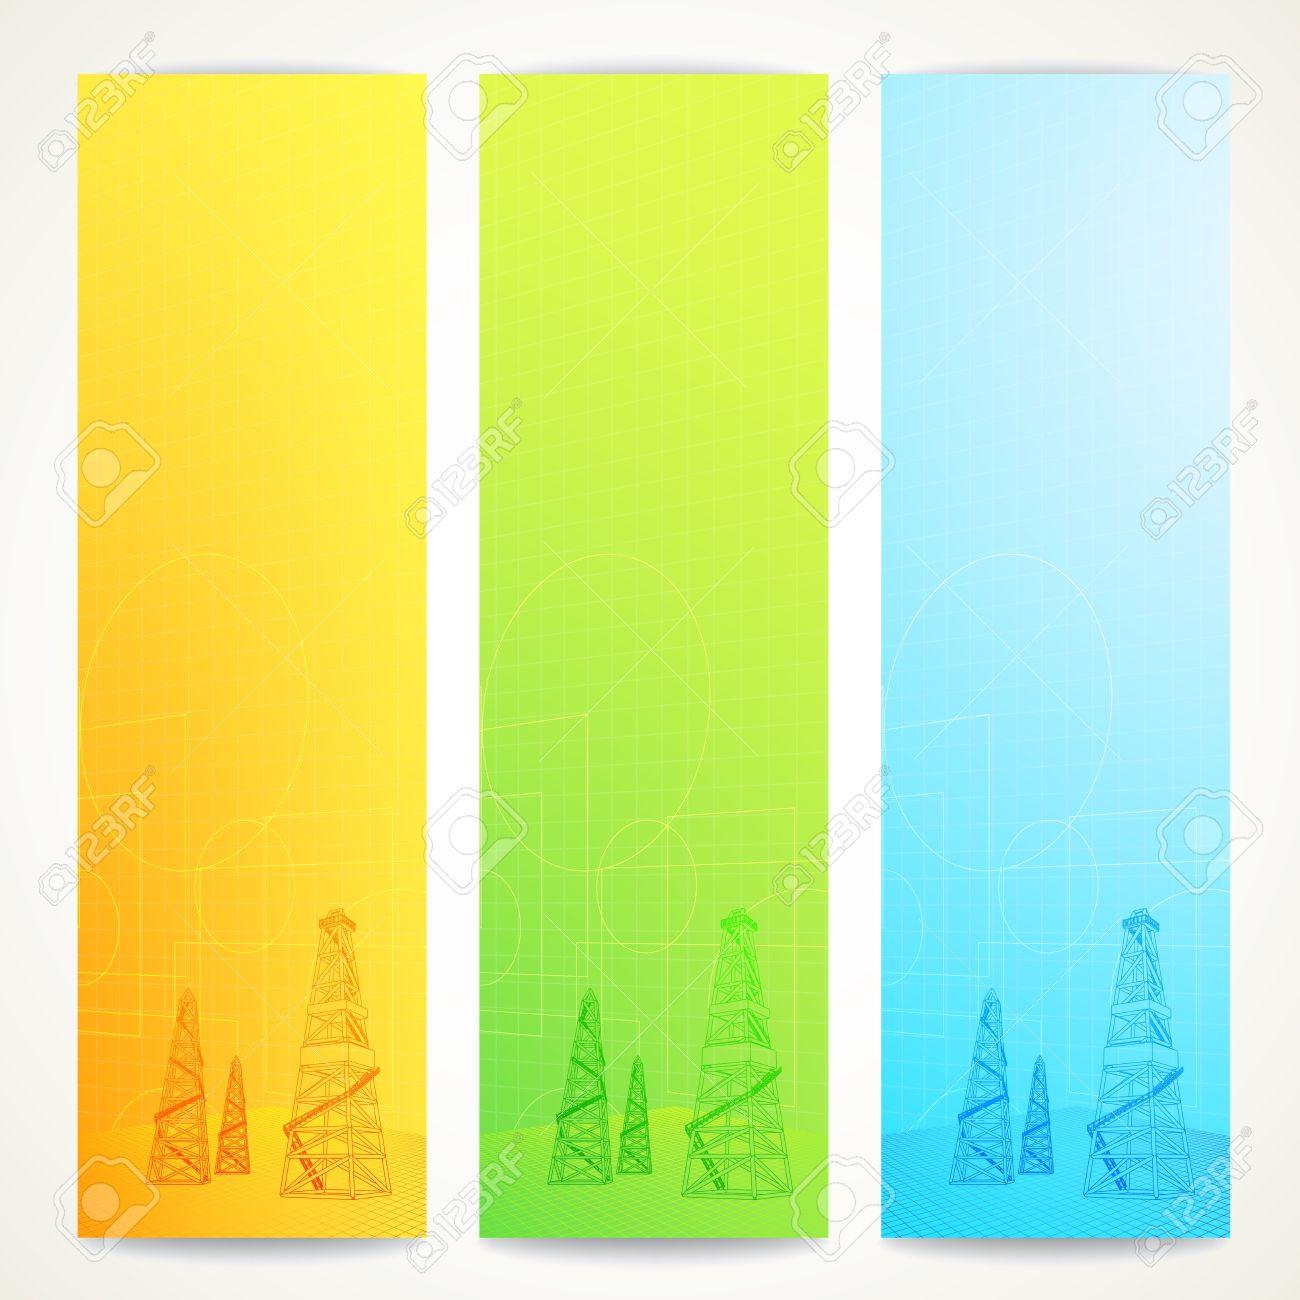 Oil Derrick Over Vertical Banner Vector Illustration Royalty Free ...